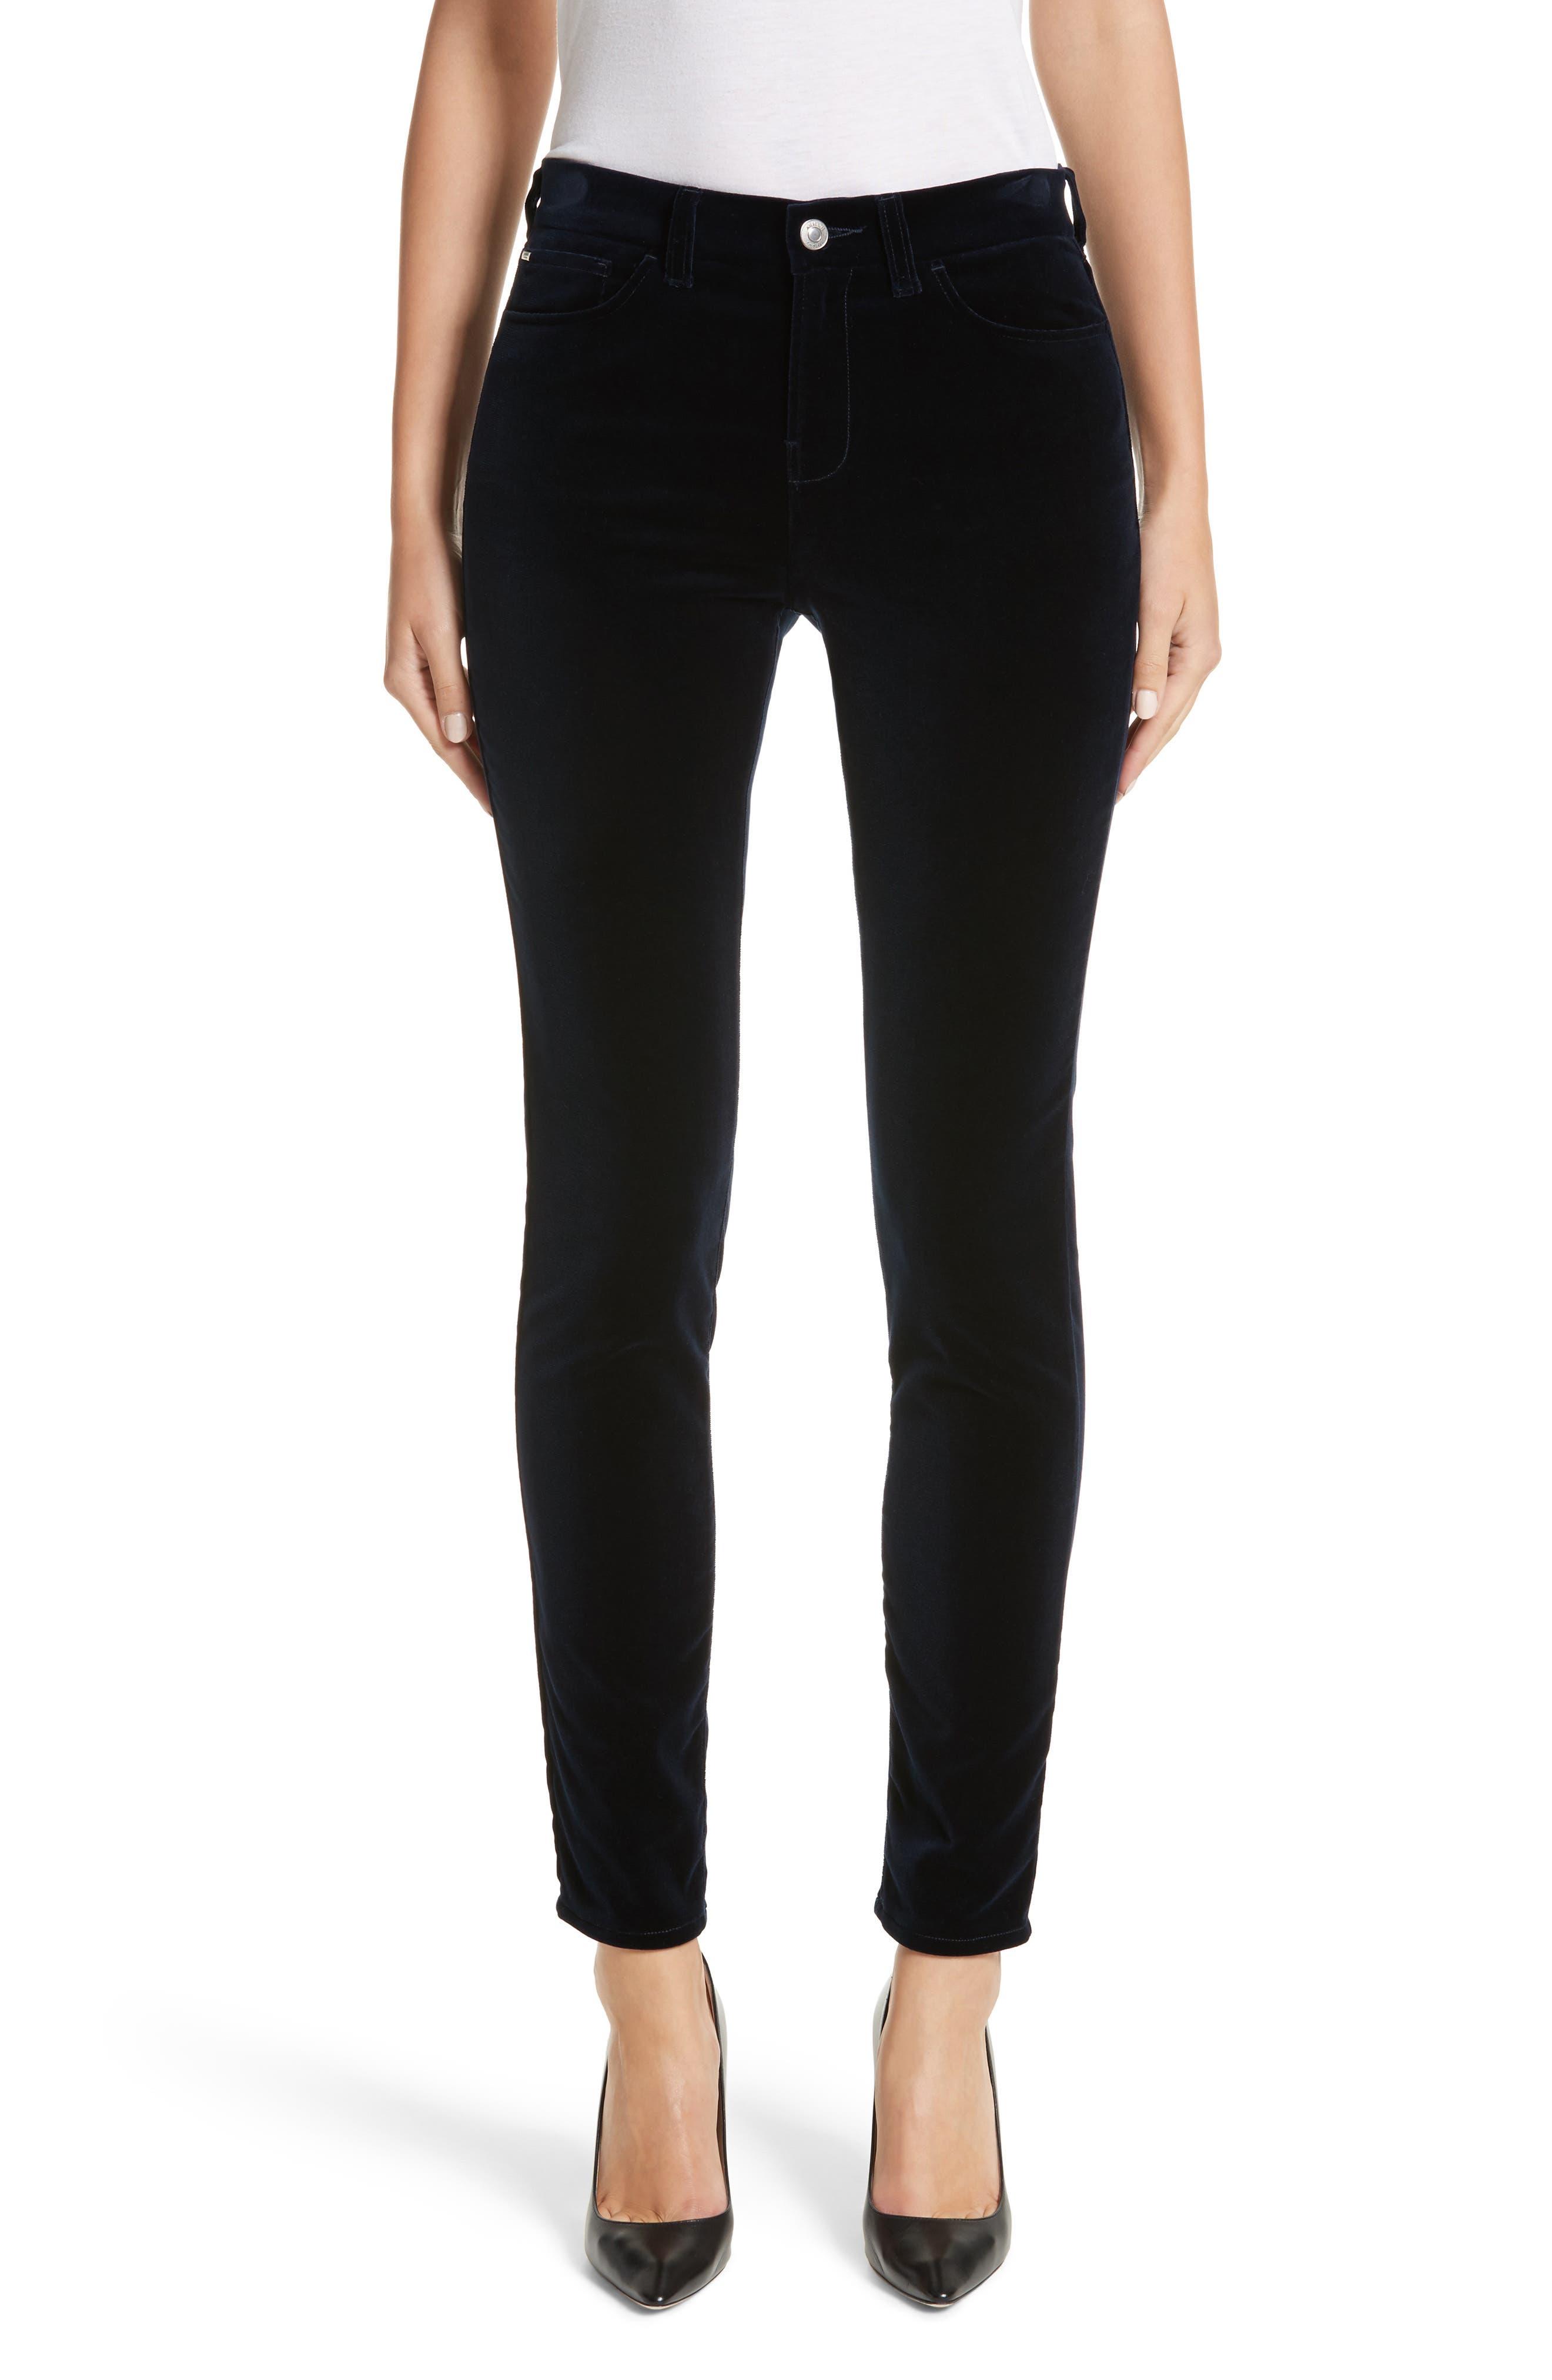 Alternate Image 1 Selected - Armani Collezioni Velvet Straight Leg Pants